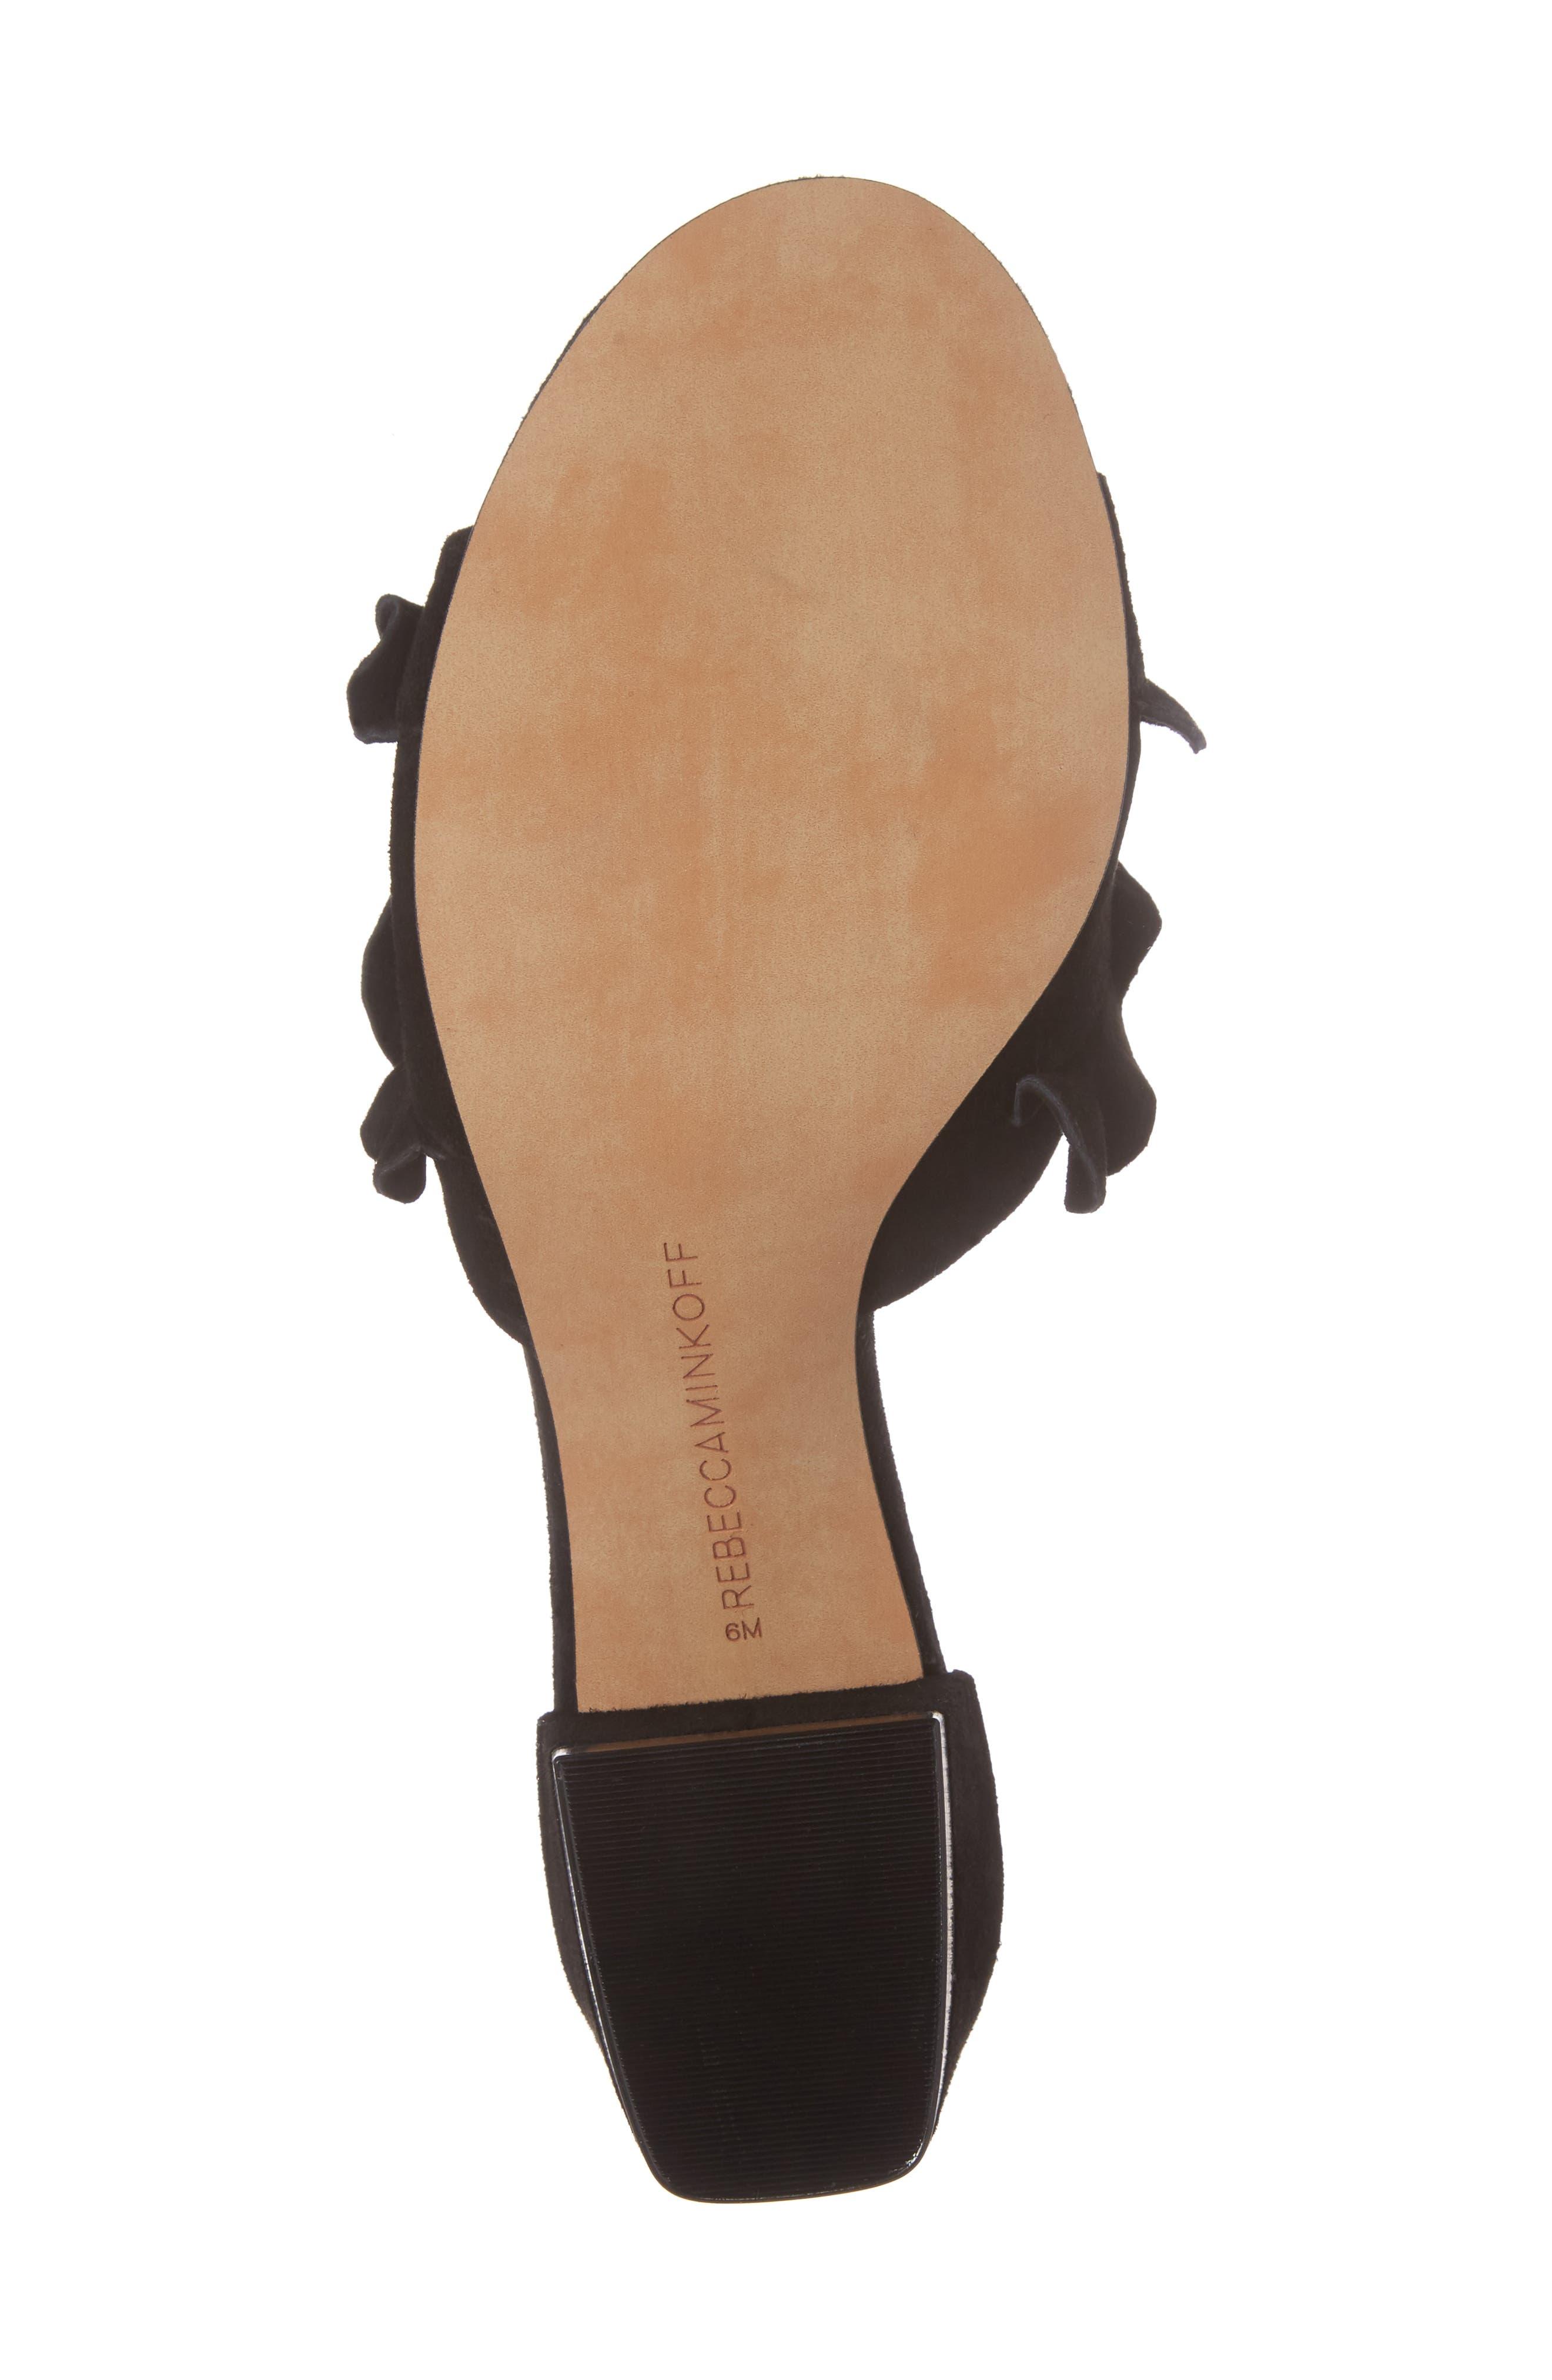 Isabelle Ruffle Mule Sandal,                             Alternate thumbnail 6, color,                             004